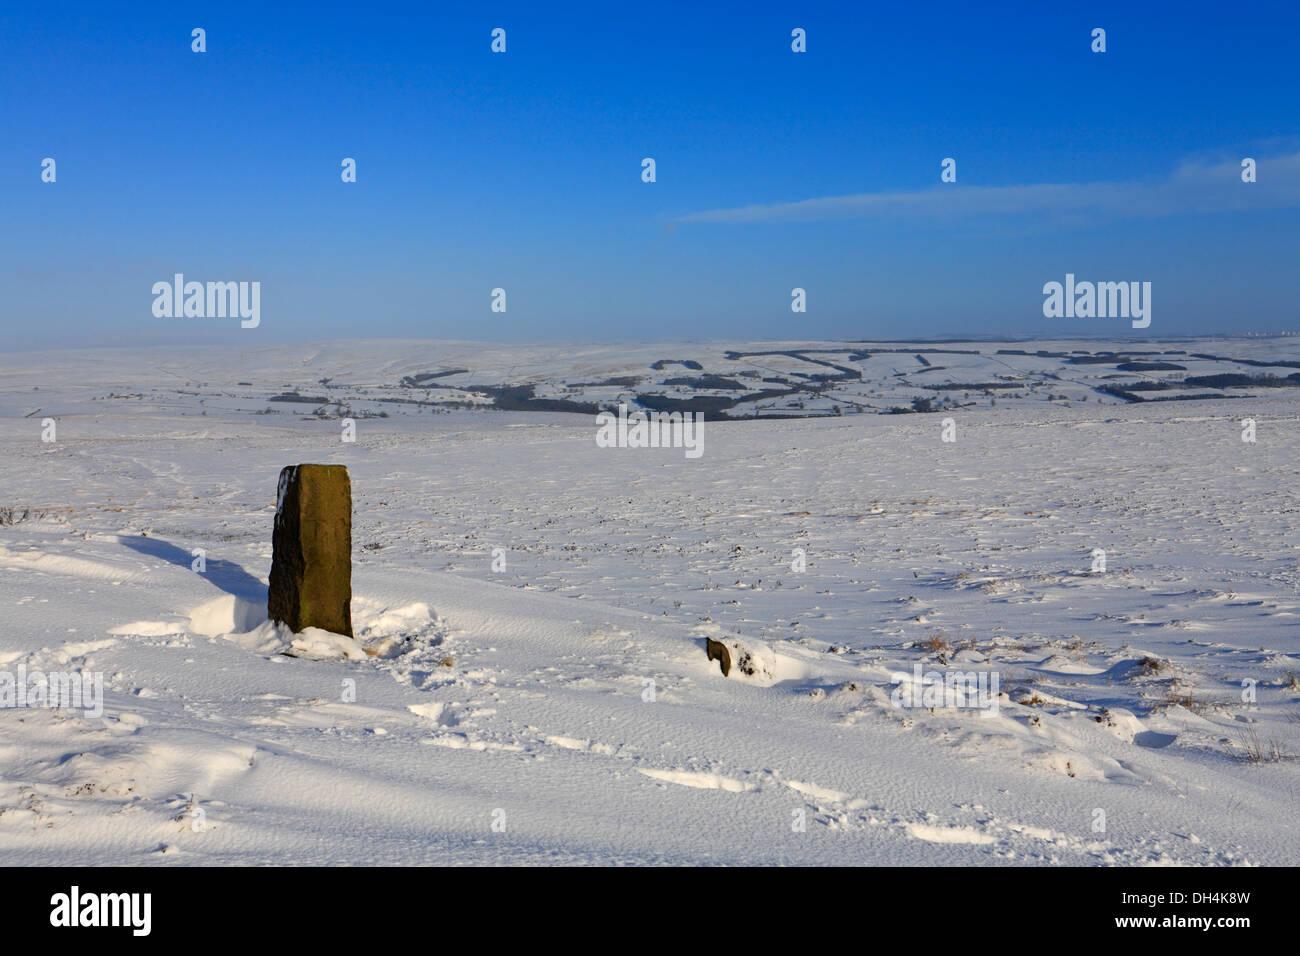 Heavy snow at Lanshaw Lad Boundary Stone on the Dales Way Link path on Ilkley Moor, Ilkley, West Yorkshire, England, UK. - Stock Image